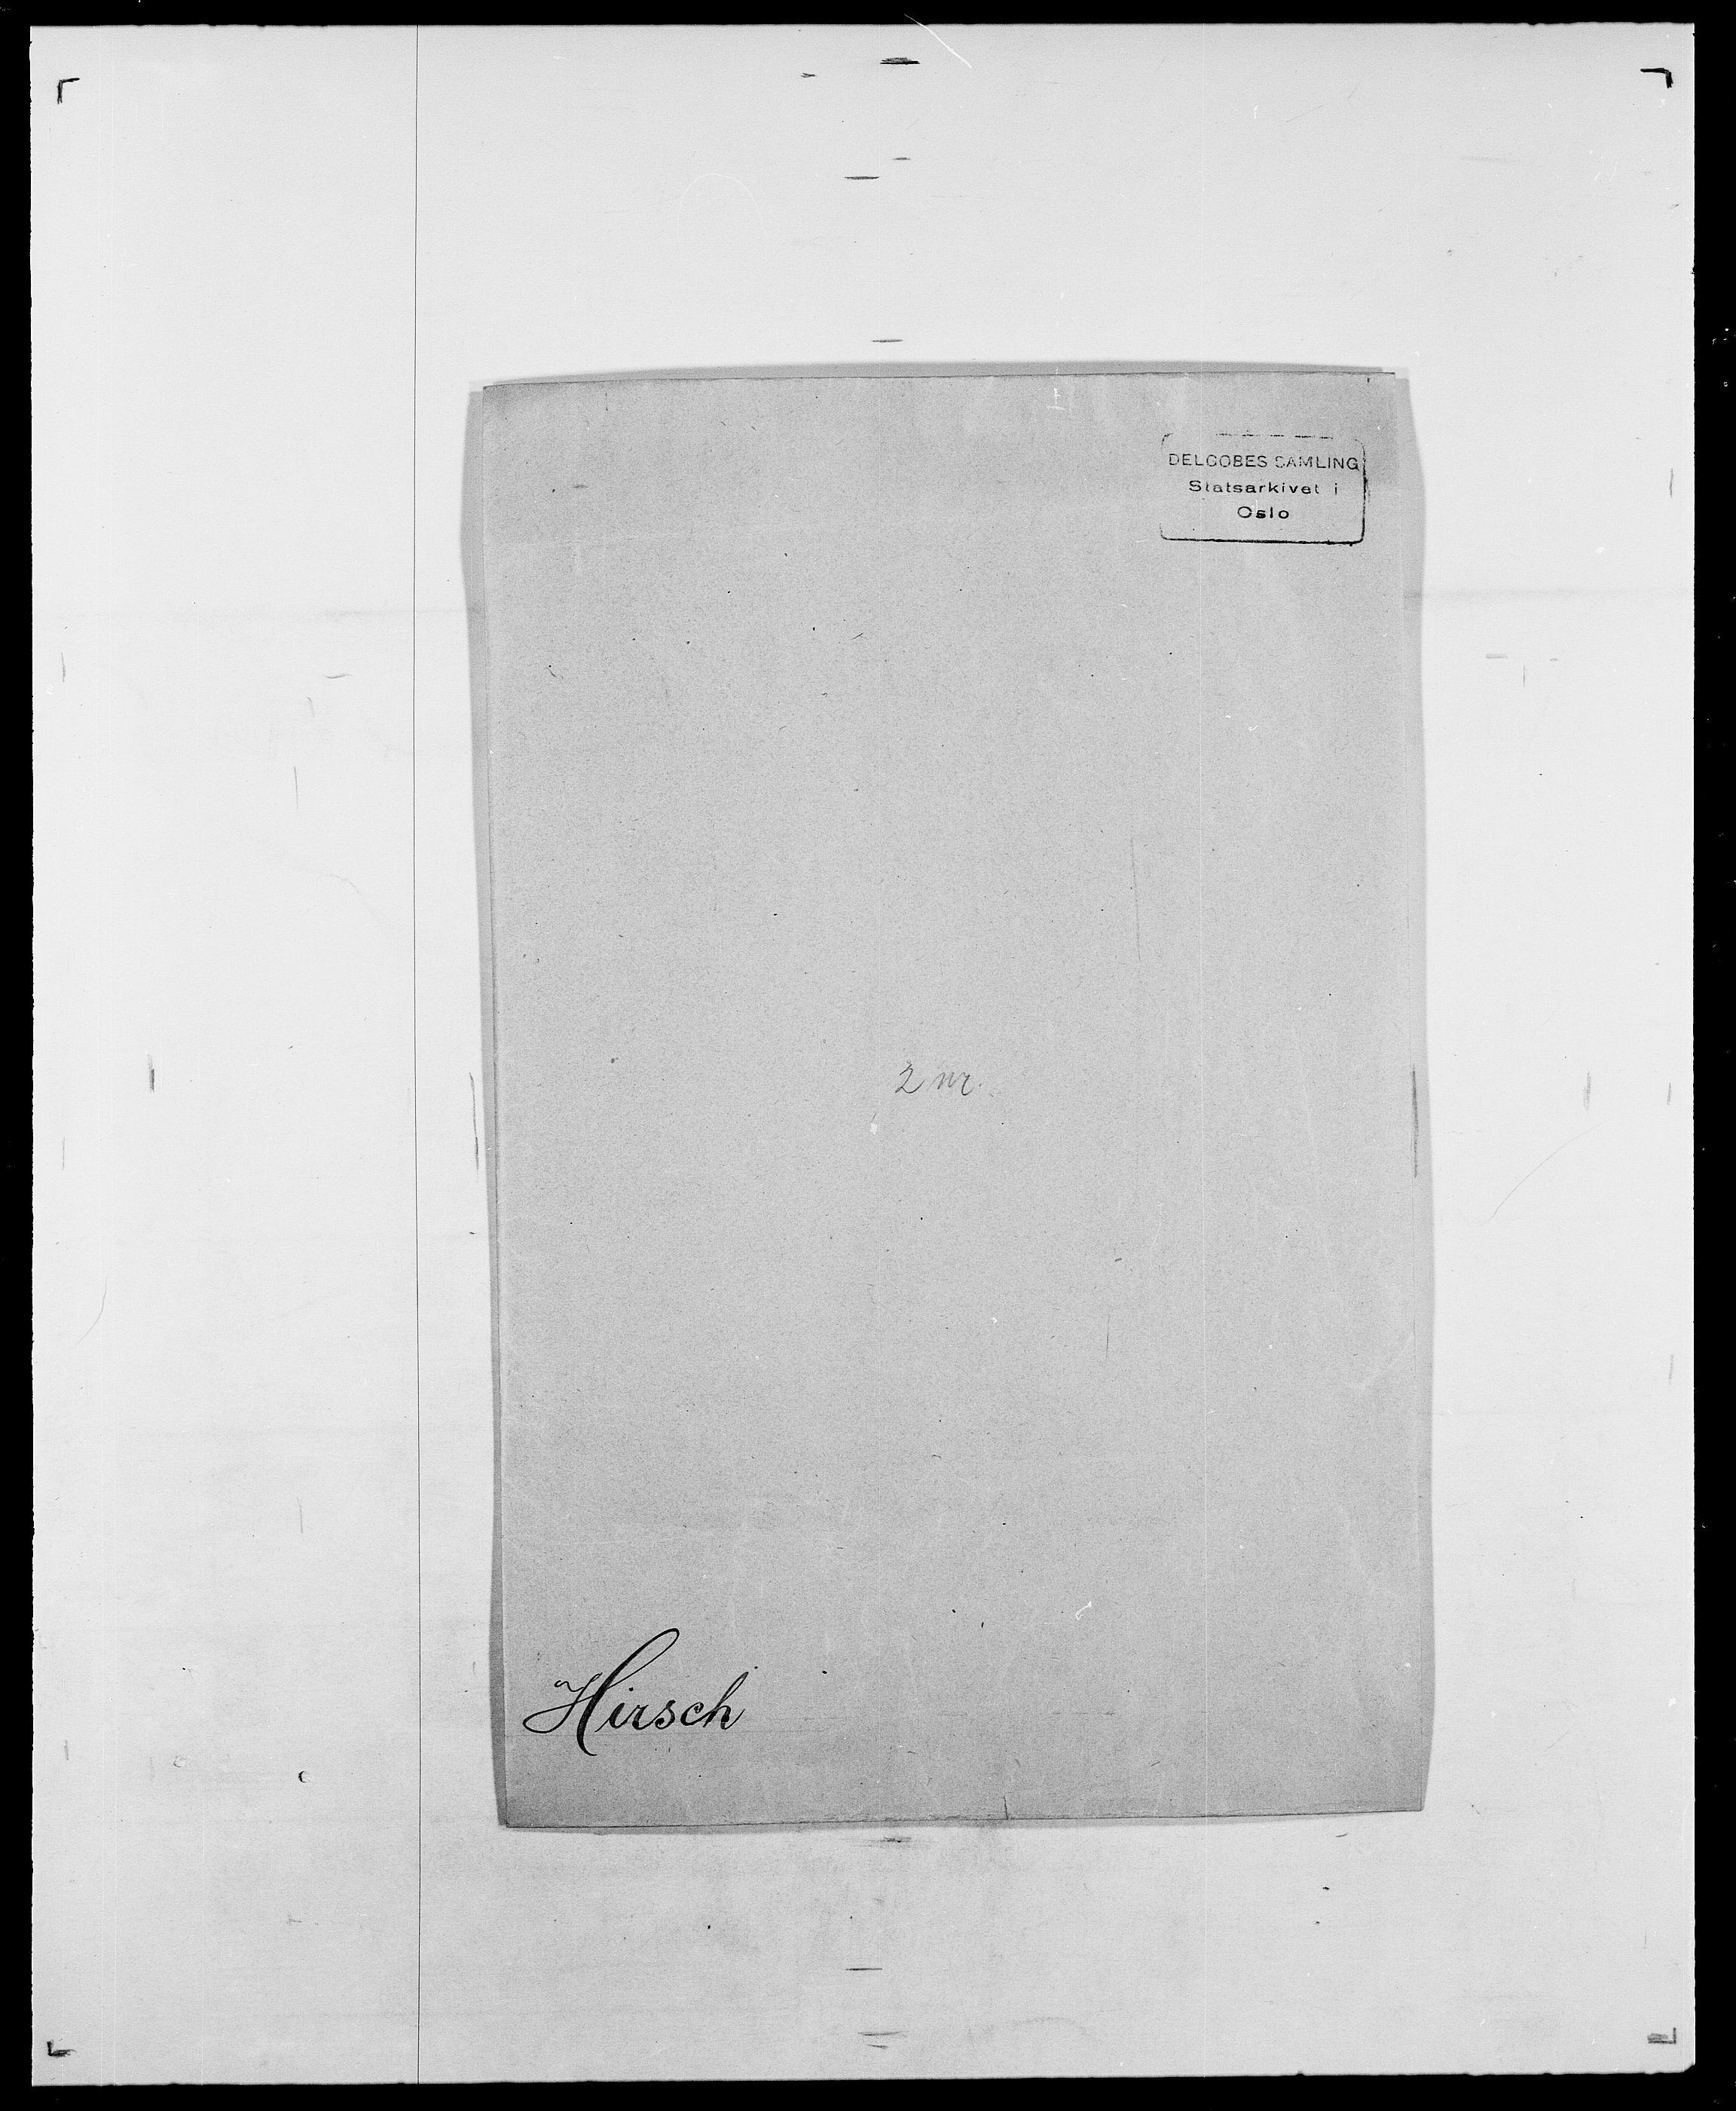 SAO, Delgobe, Charles Antoine - samling, D/Da/L0017: Helander - Hjørne, s. 513